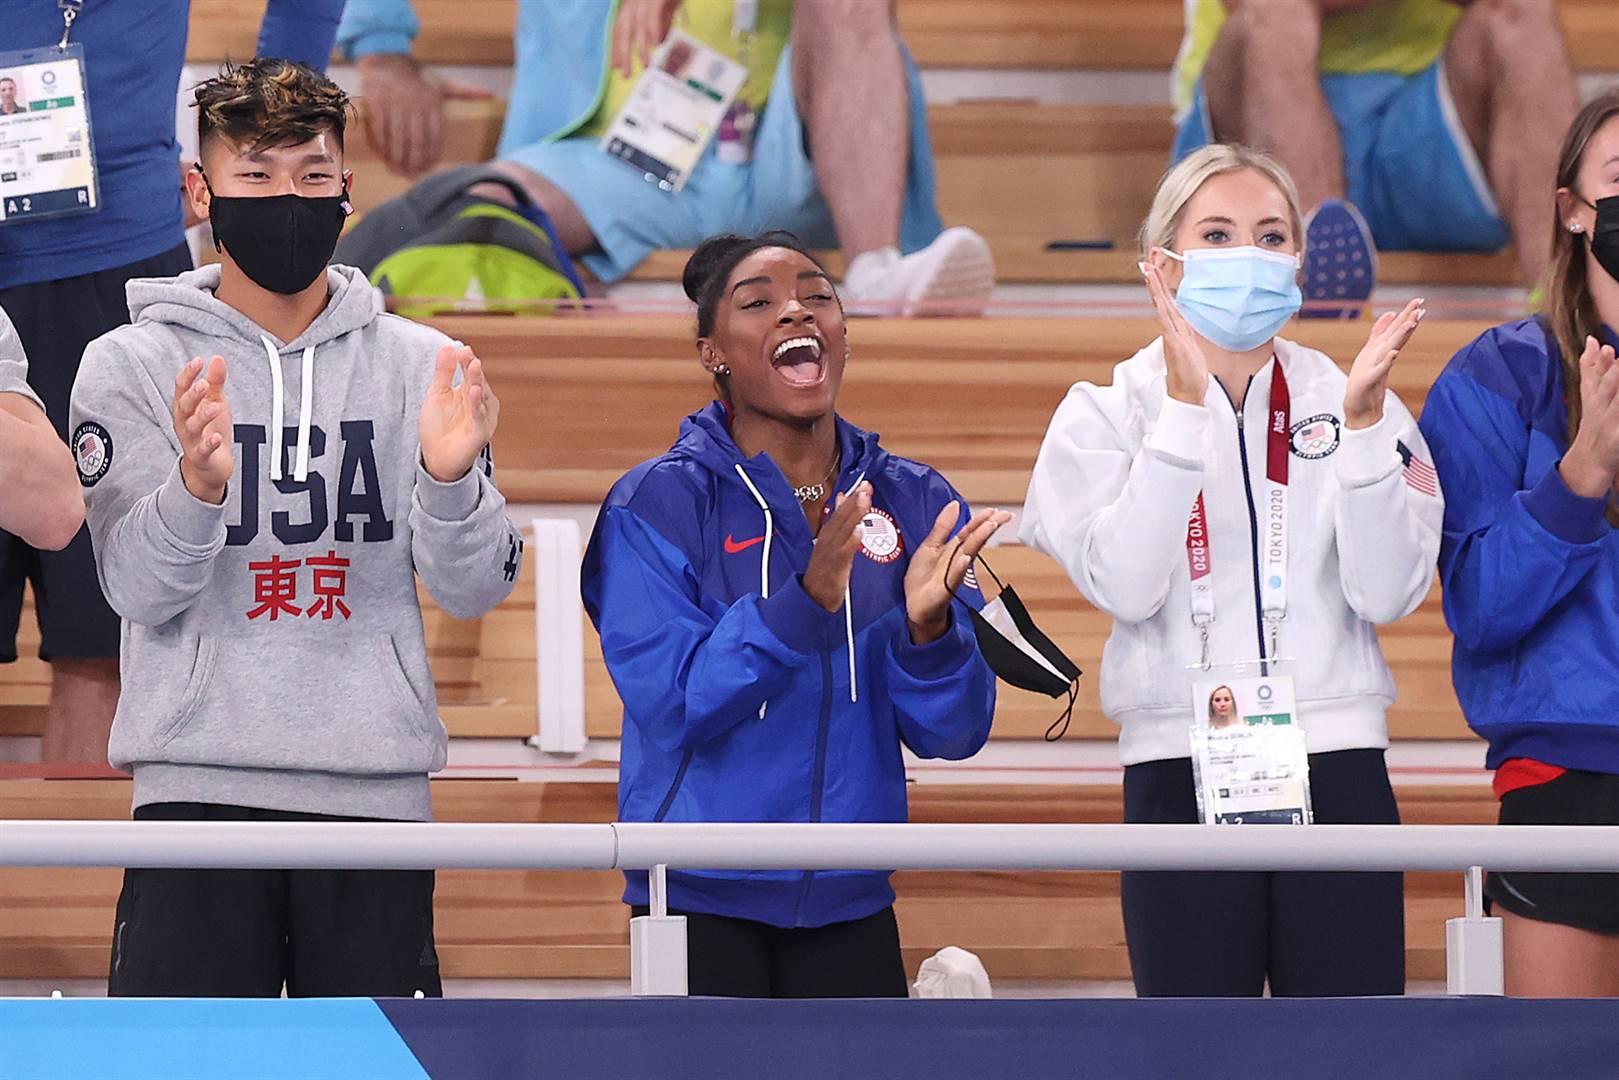 Simone Biles moedig haar spanmaats aan in Tokio. Foto: Getty Images